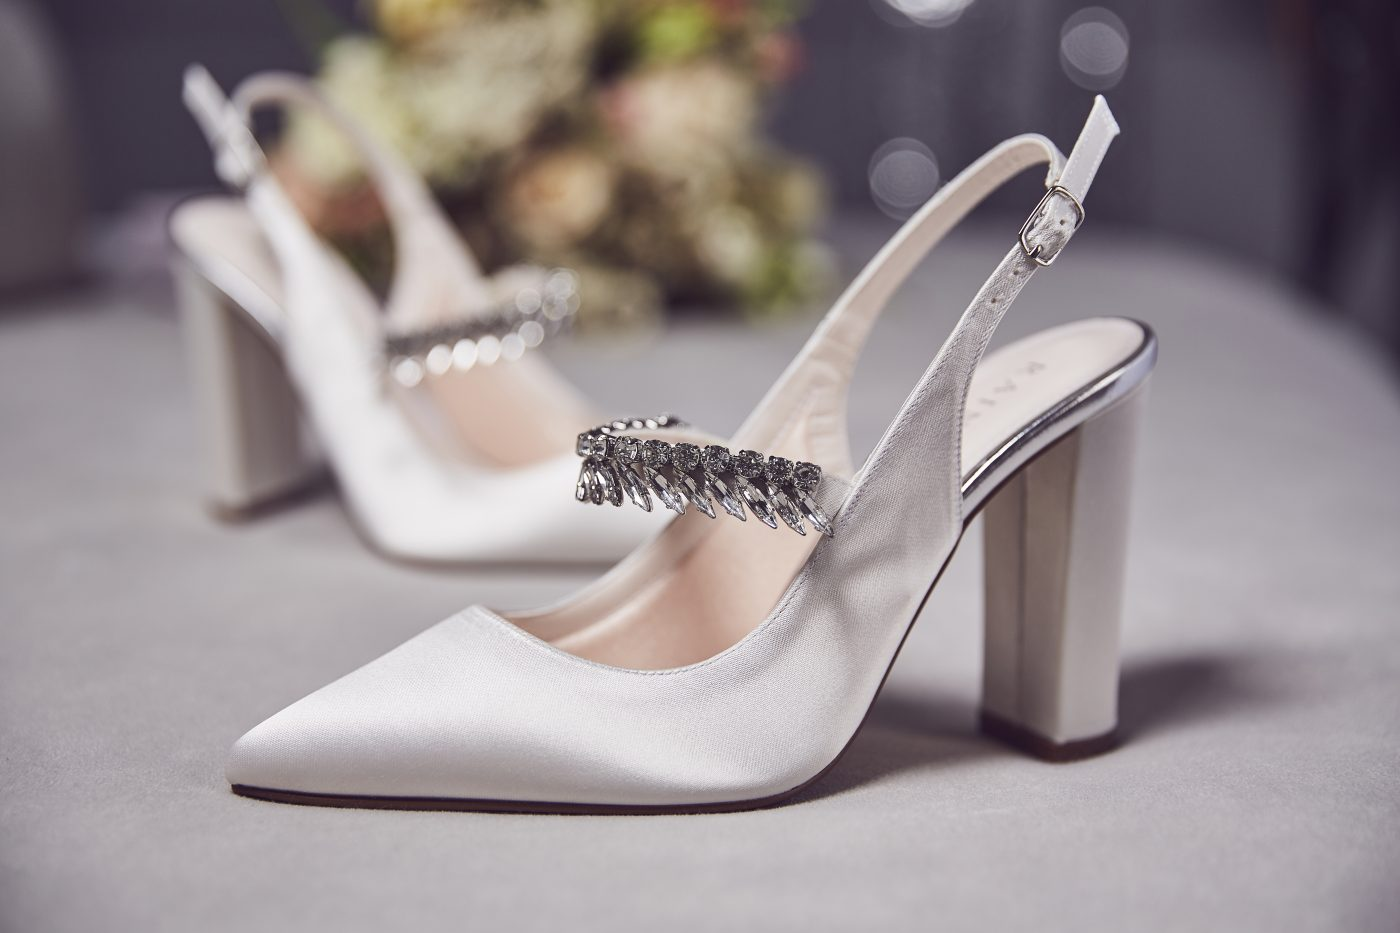 "<a href=""https://www.rainbowclub.co.uk/freya-slingback-wedding-shoes"" target=""_blank"" rel=""noopener noreferrer"">Freya Ivory by Rainbow Club</a> £99"